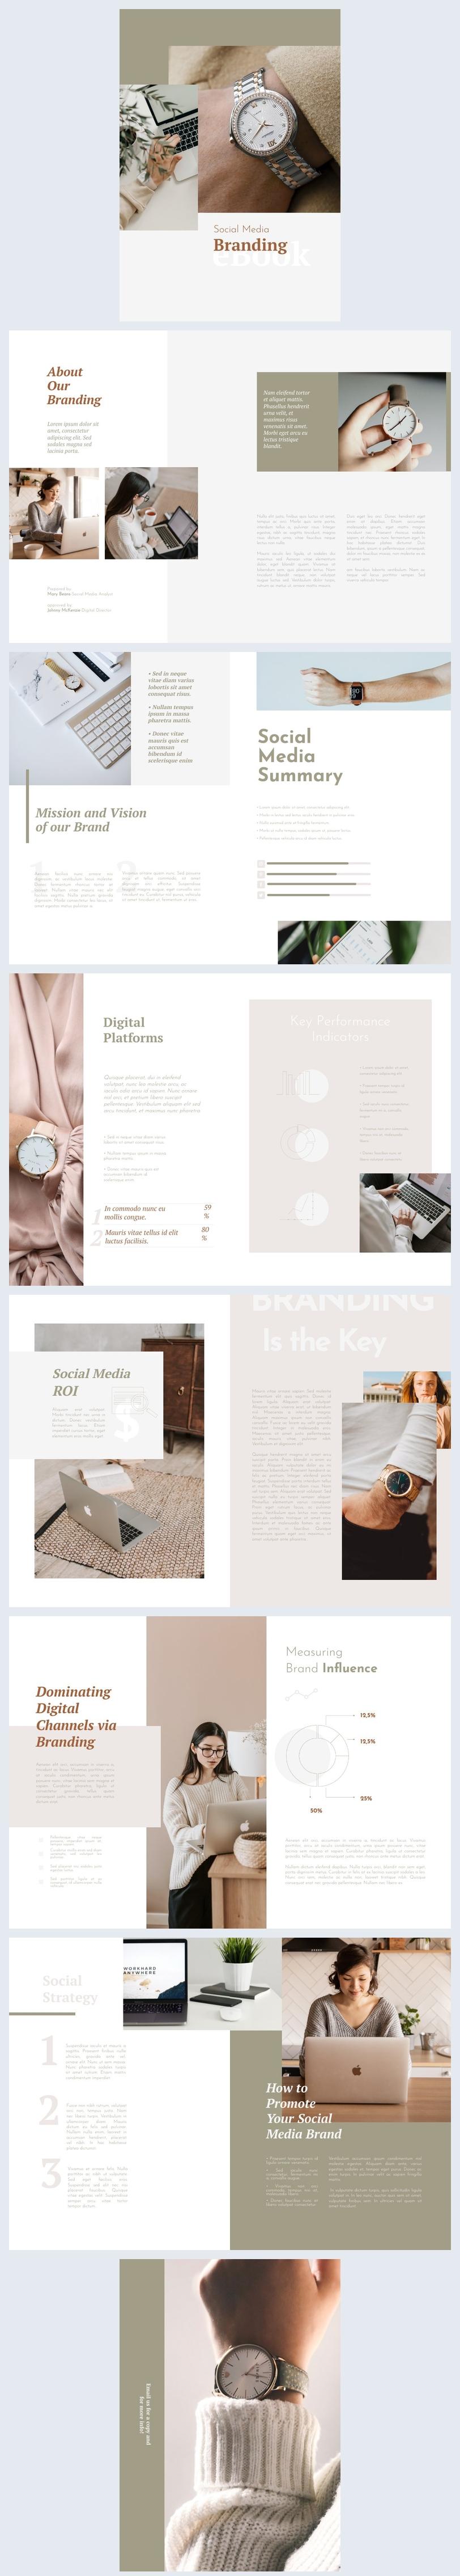 Social Media Branding eBook Design Example